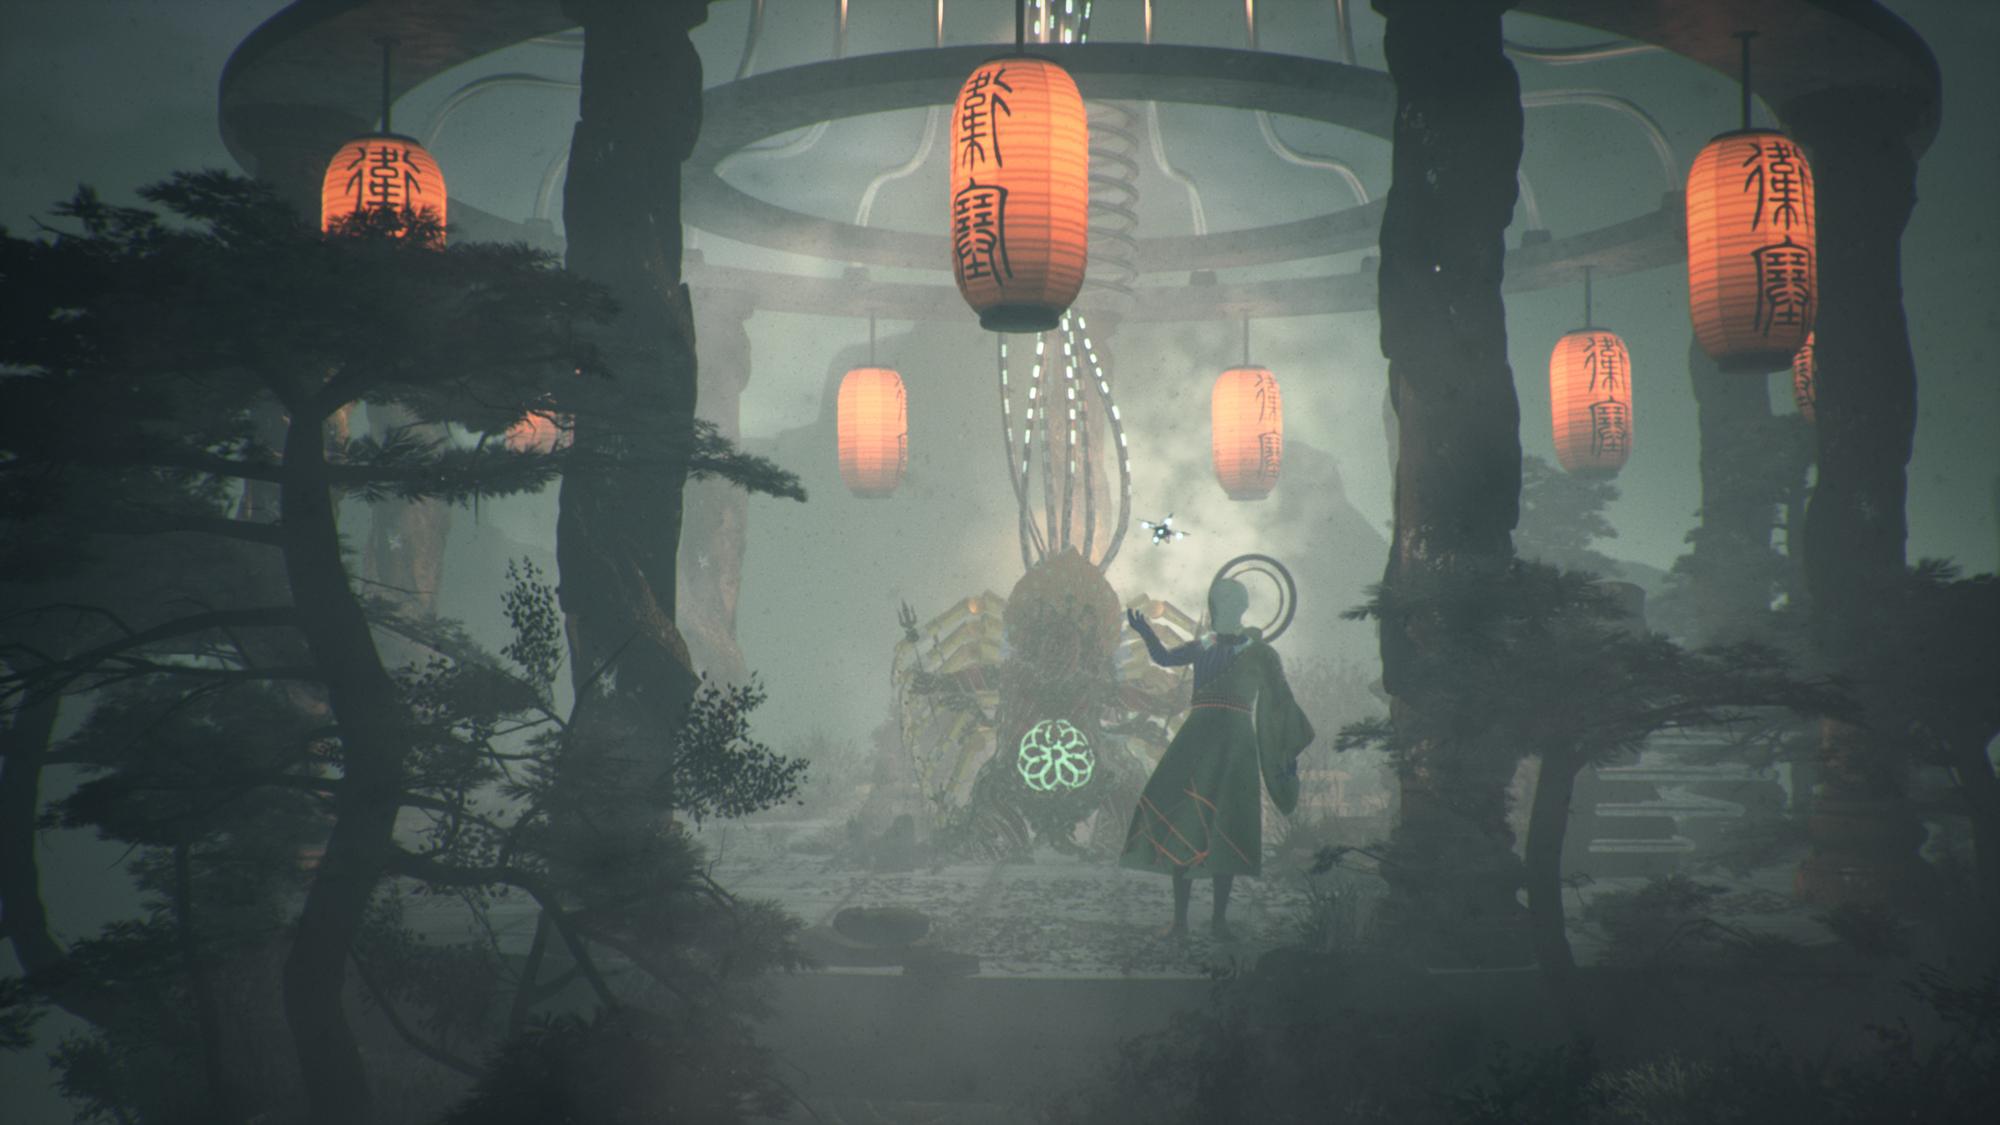 film still animation lanterns forrest